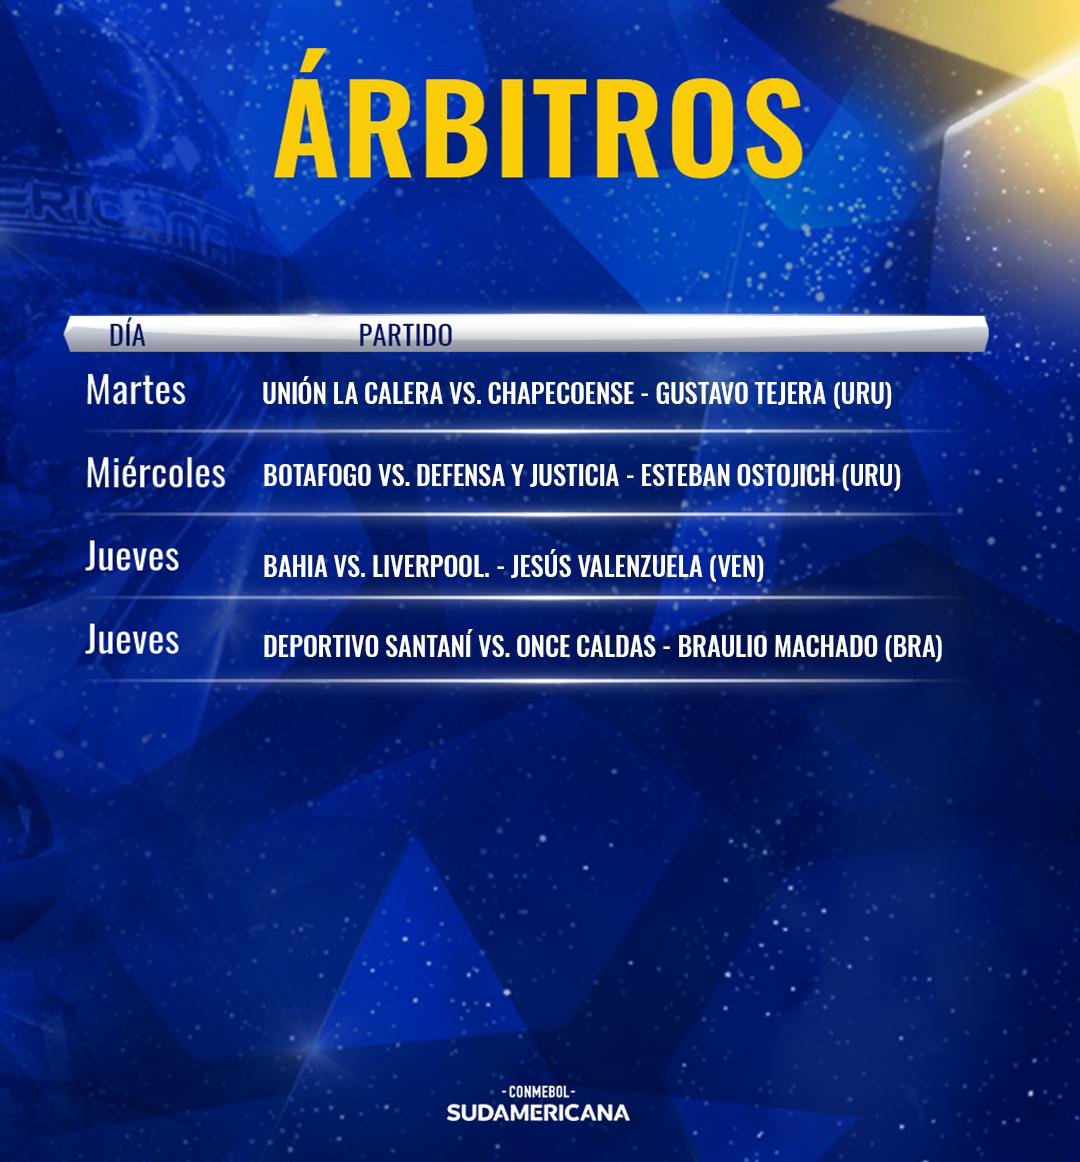 Arbitros Copa Sudamericana 2019